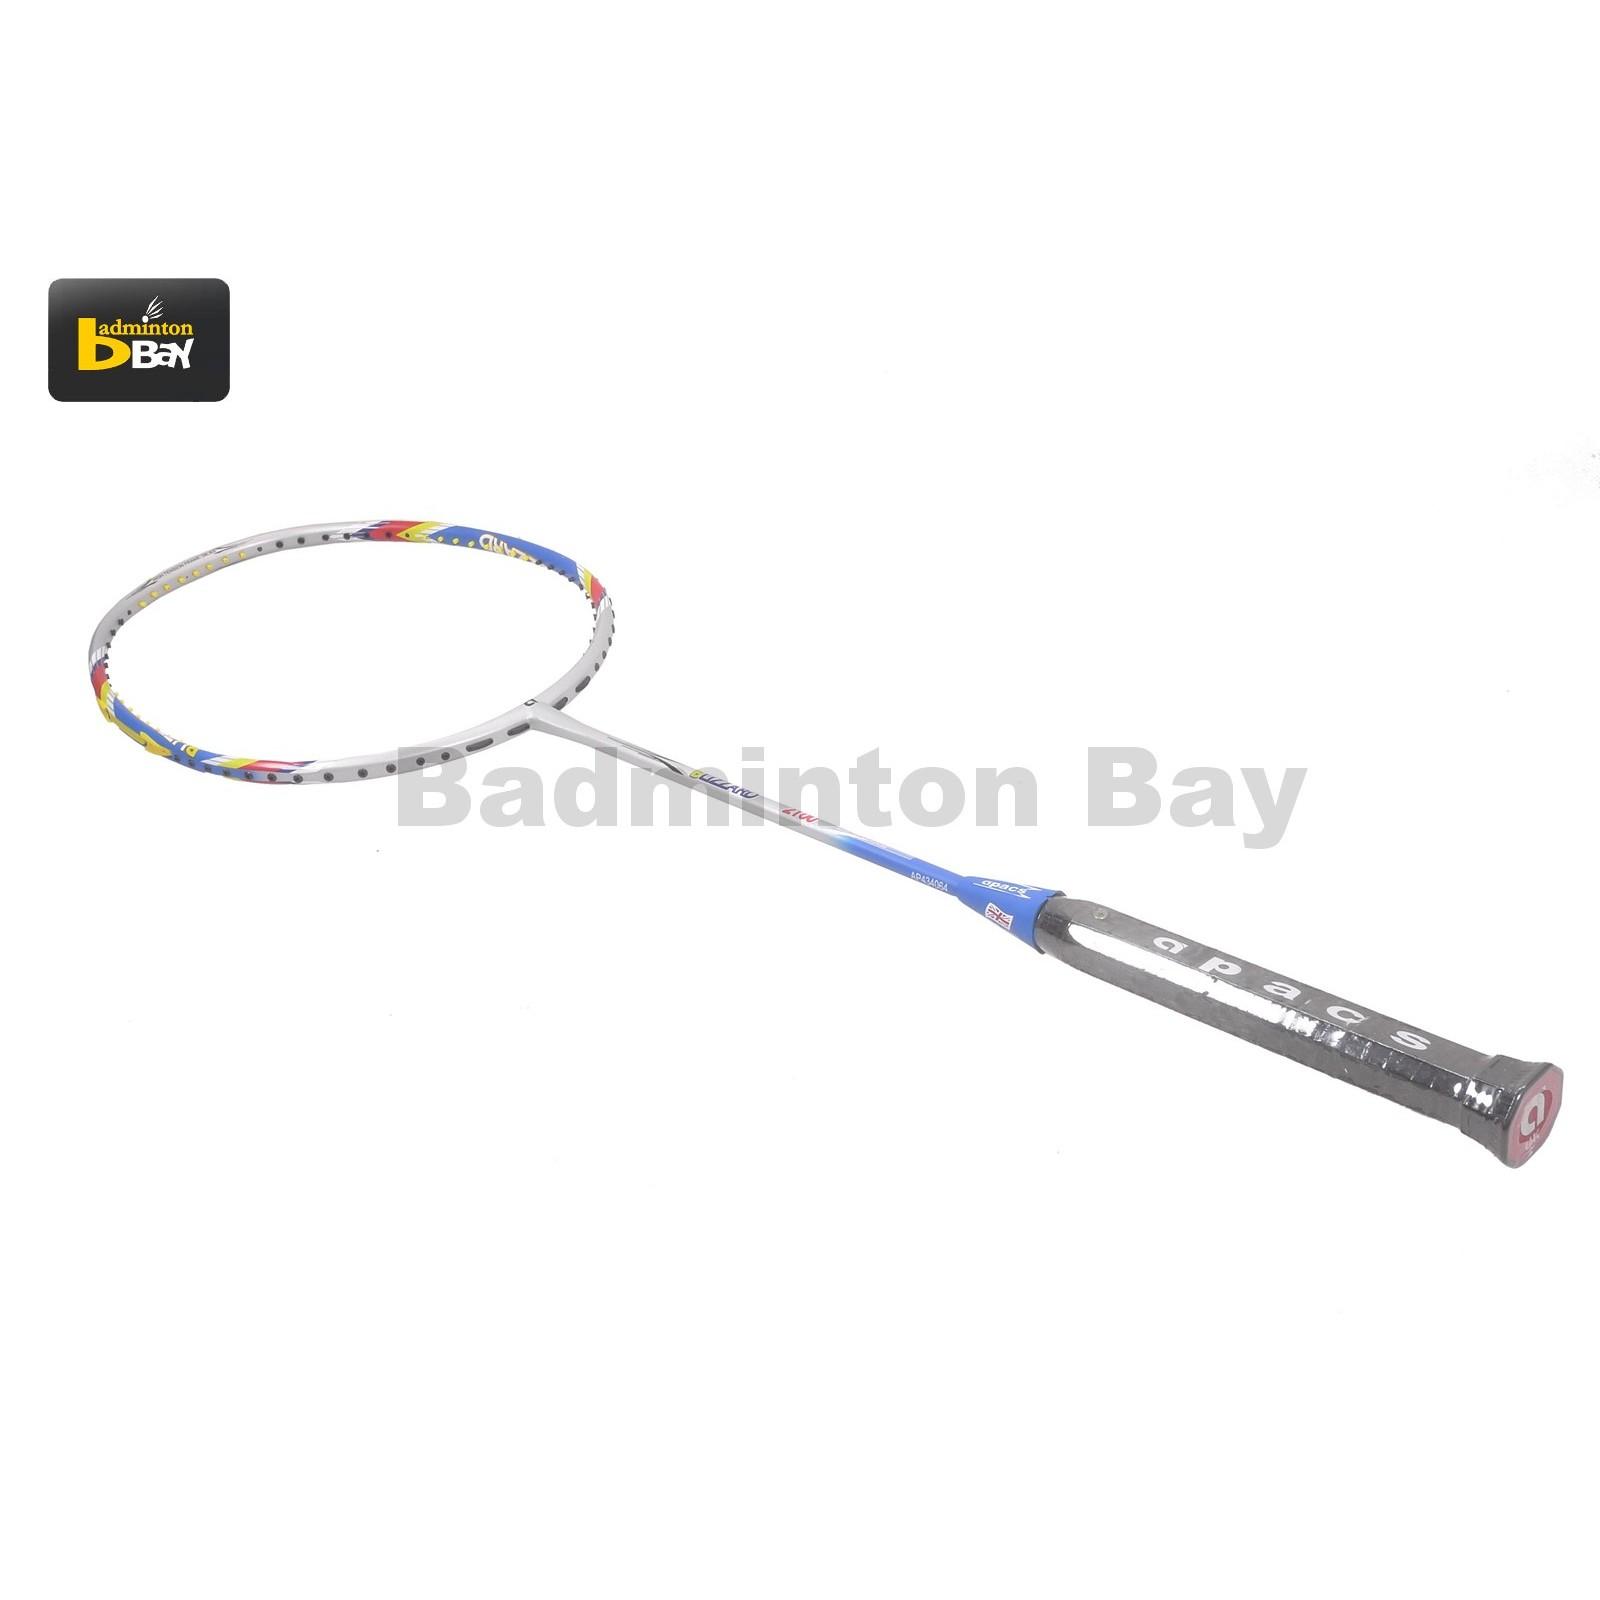 Out Of Stock Apacs Blizzard 5u Badminton Racket